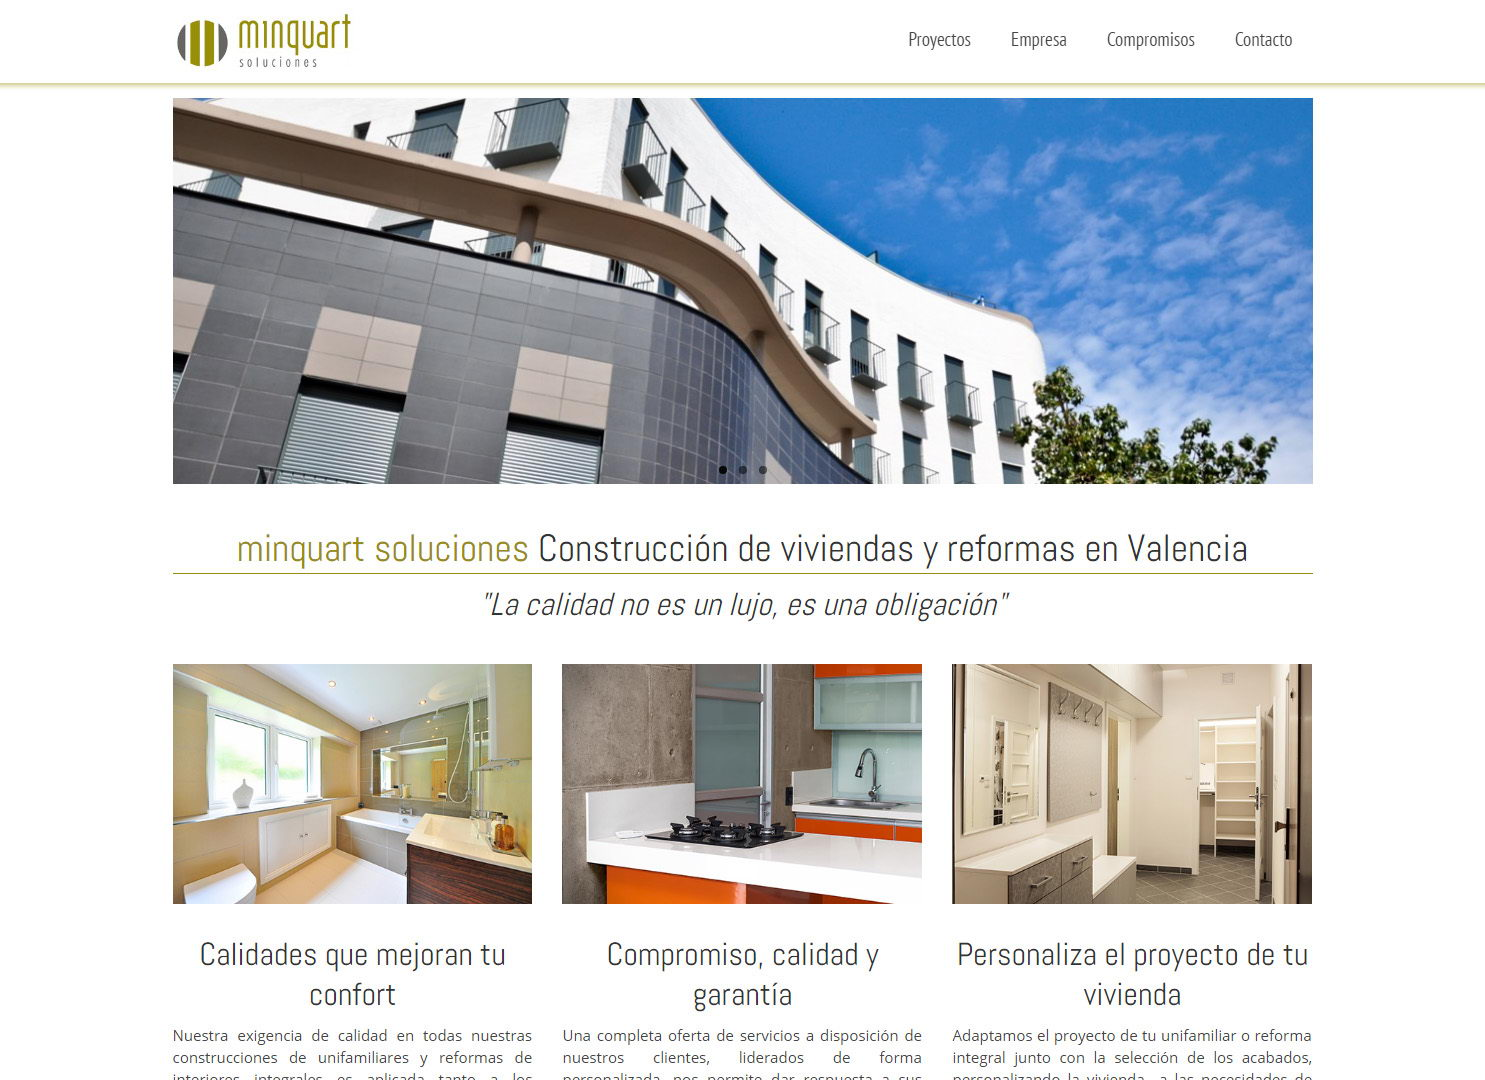 minquart soluciones empresa construccion reformas valencia diseño web wordpress